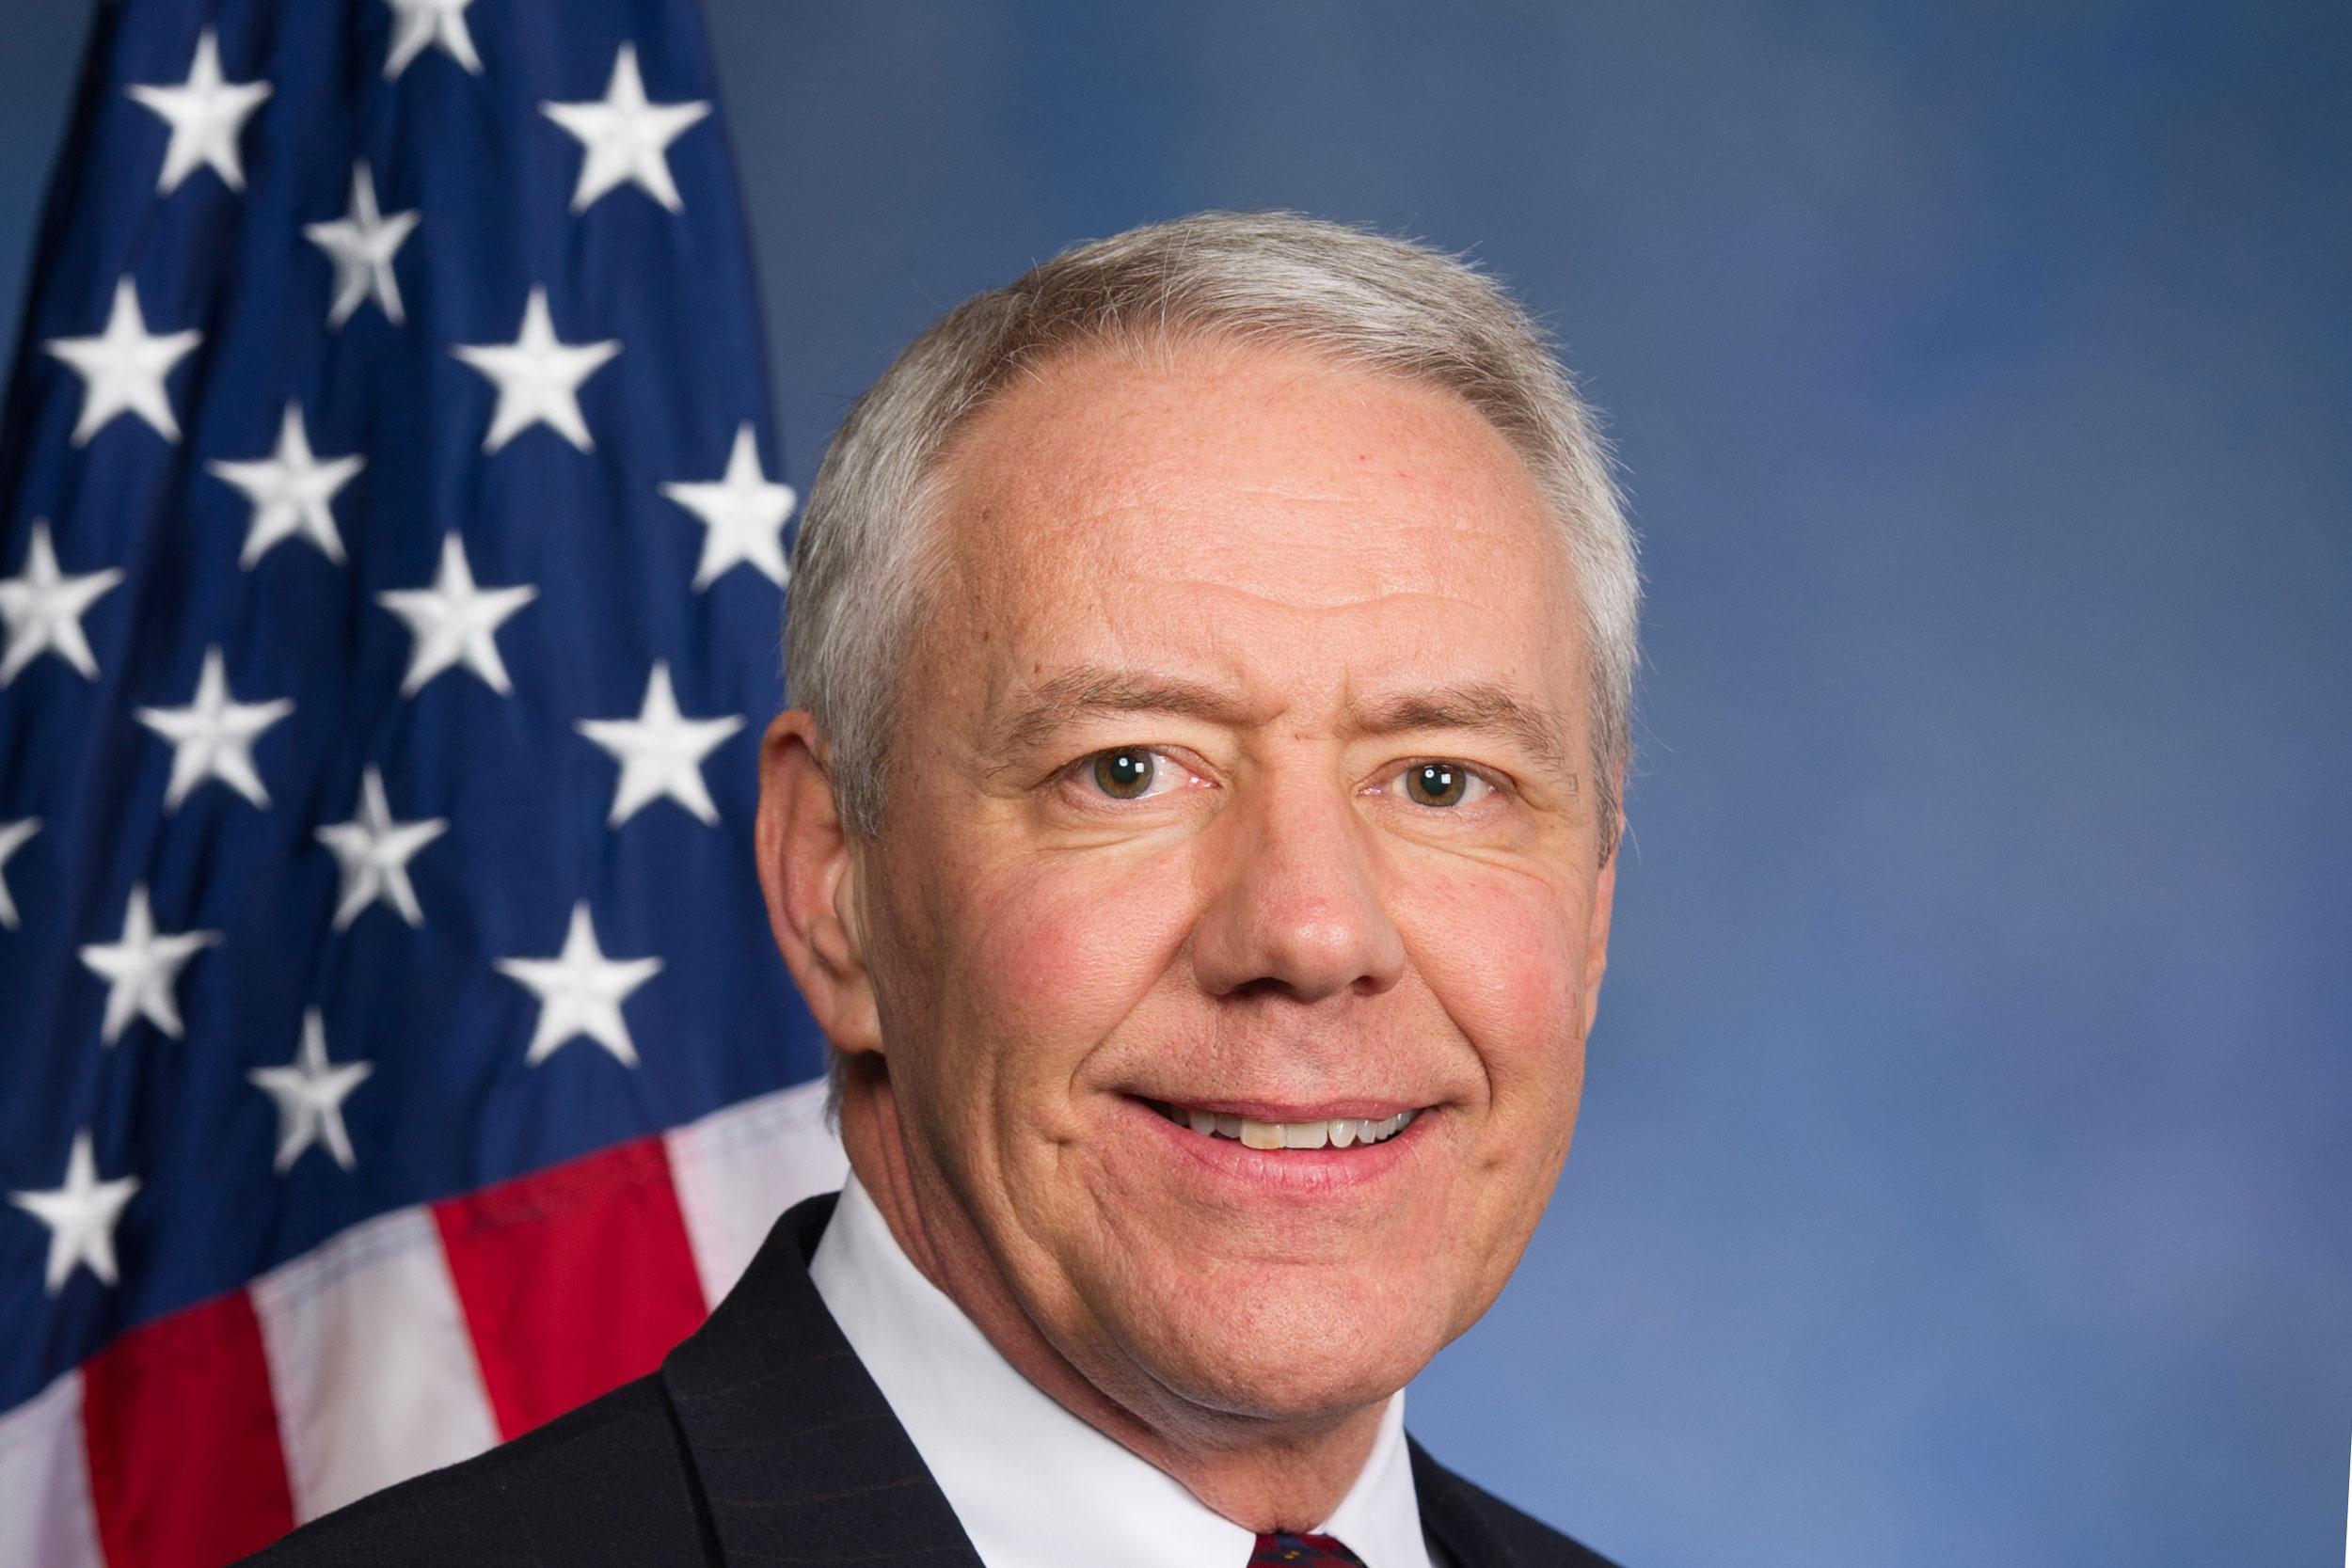 Colorado Republican Representative Ken Buck serves the state's 4th Congressional District.